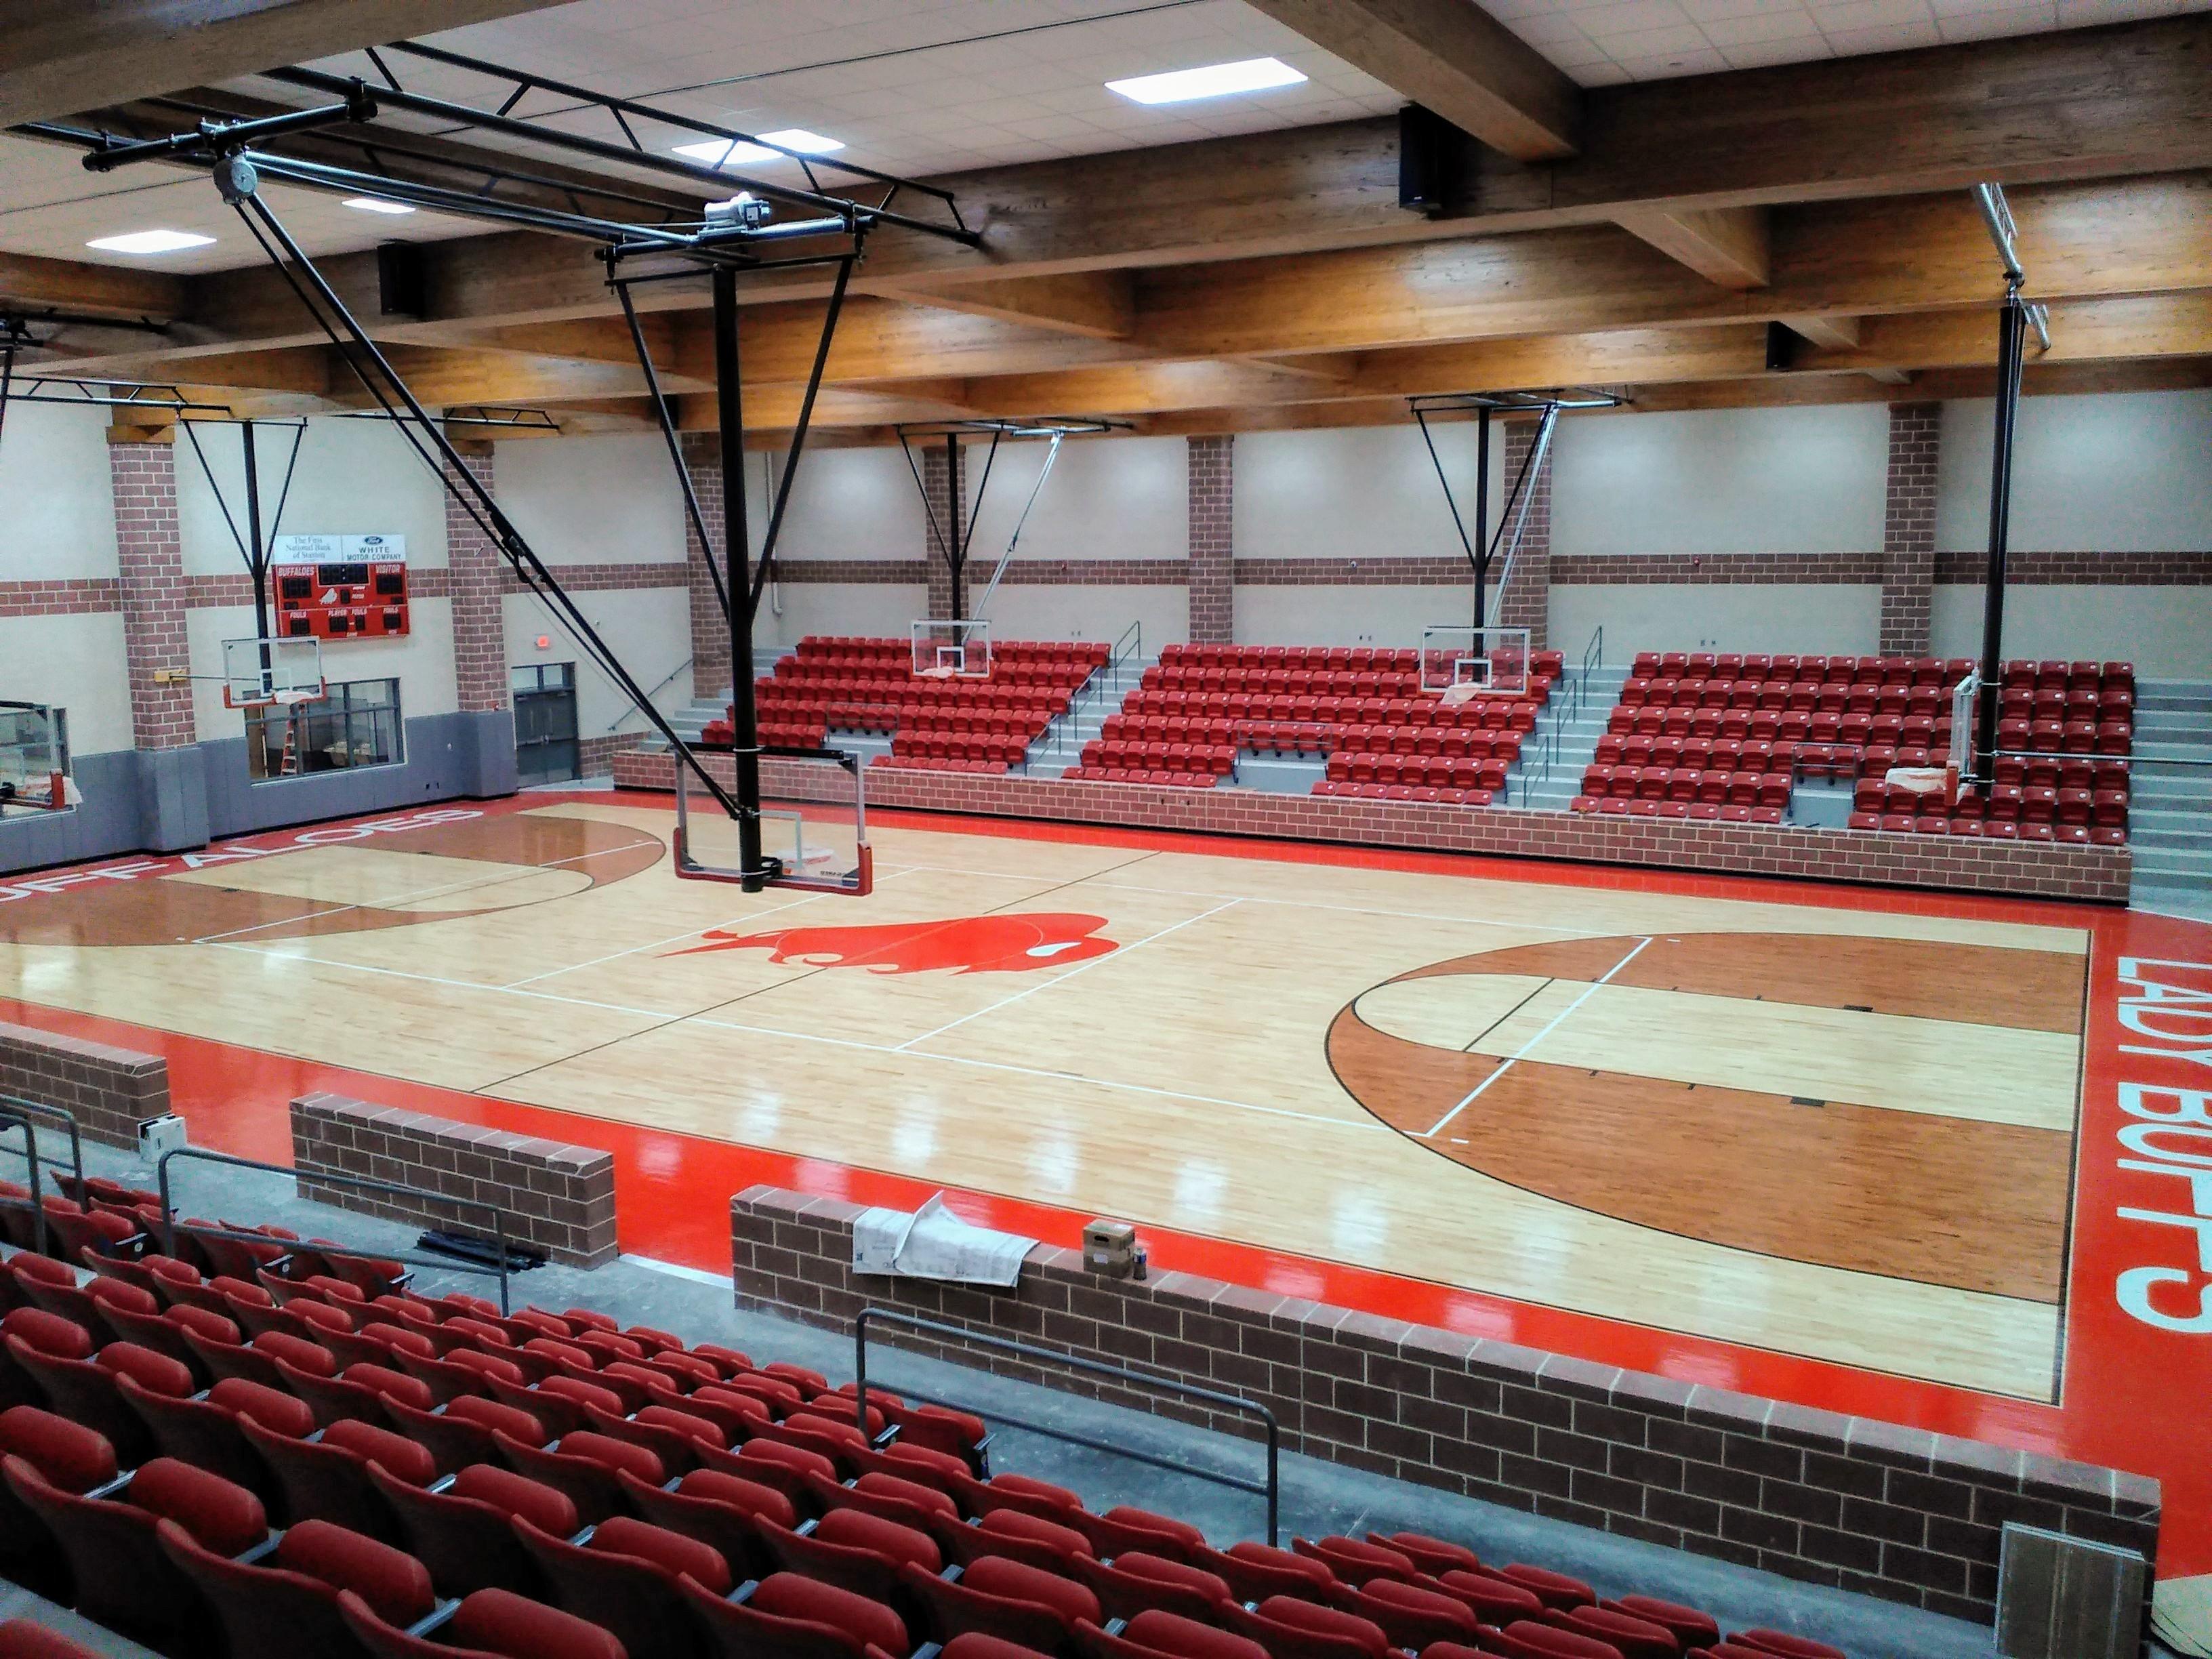 Stanton High Basketball Court